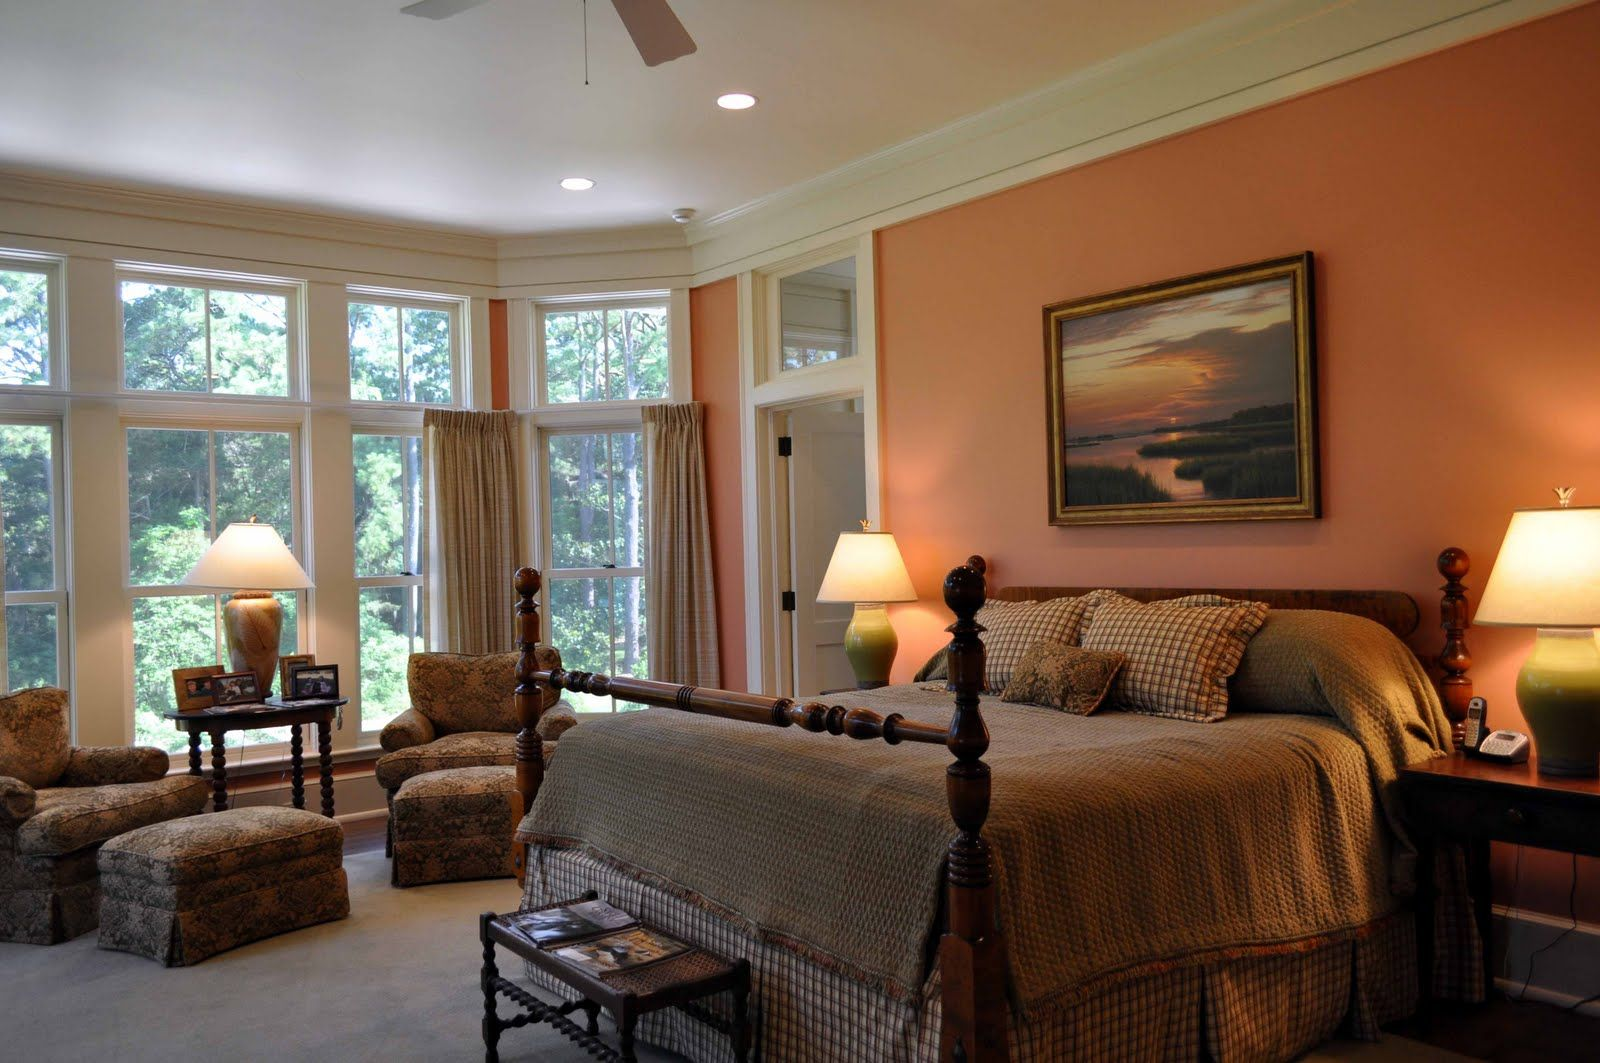 Traditional master bedroom interior design - 1000 Images About Slaapkamer On Pinterest Warm Bedroom Colors Traditional Master Bedroom Design Master Bedroom Decorating Ideas